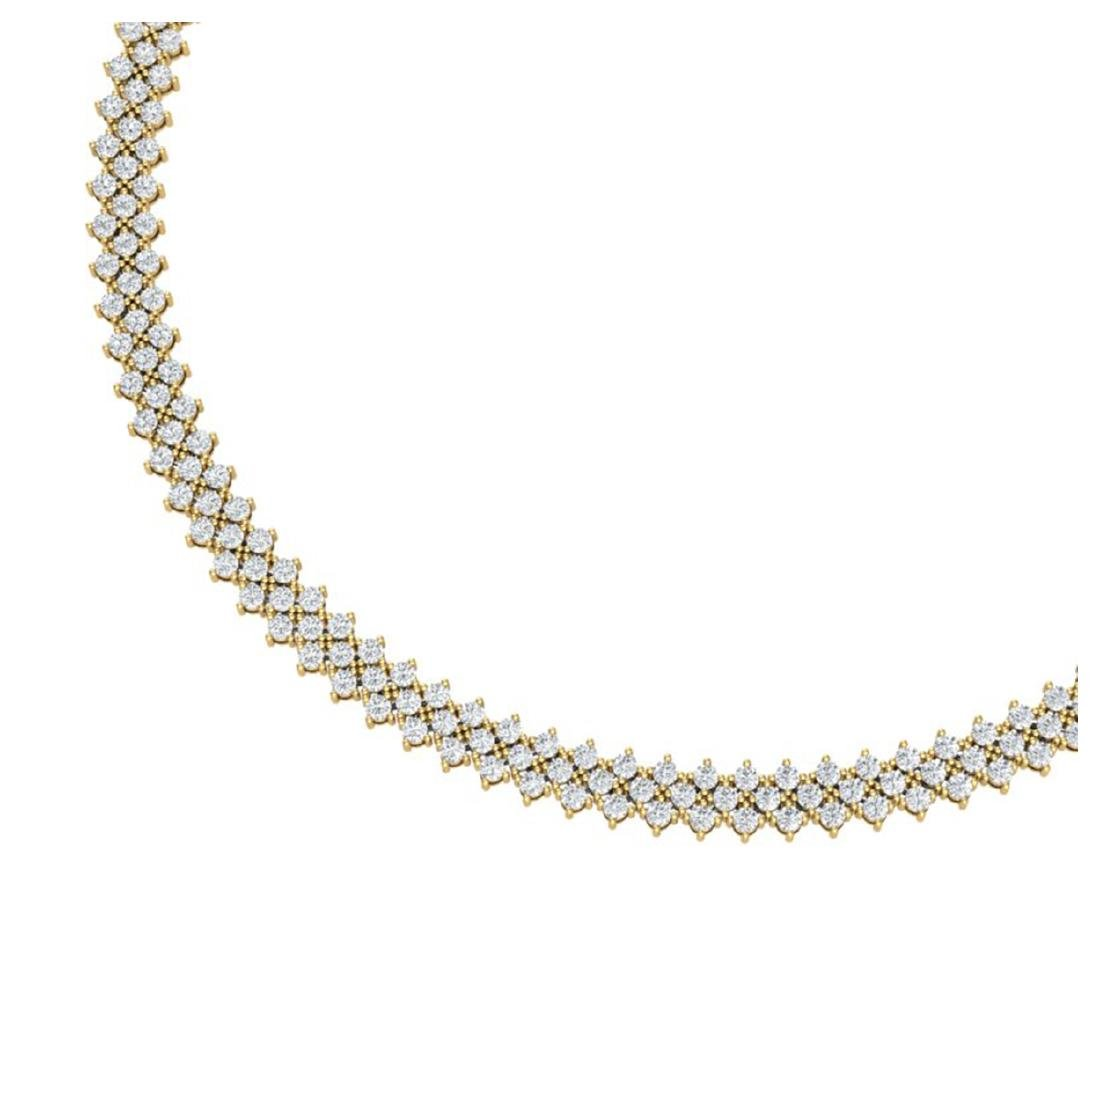 20 ctw SI/I Diamond Necklace 18K Yellow Gold - - 2